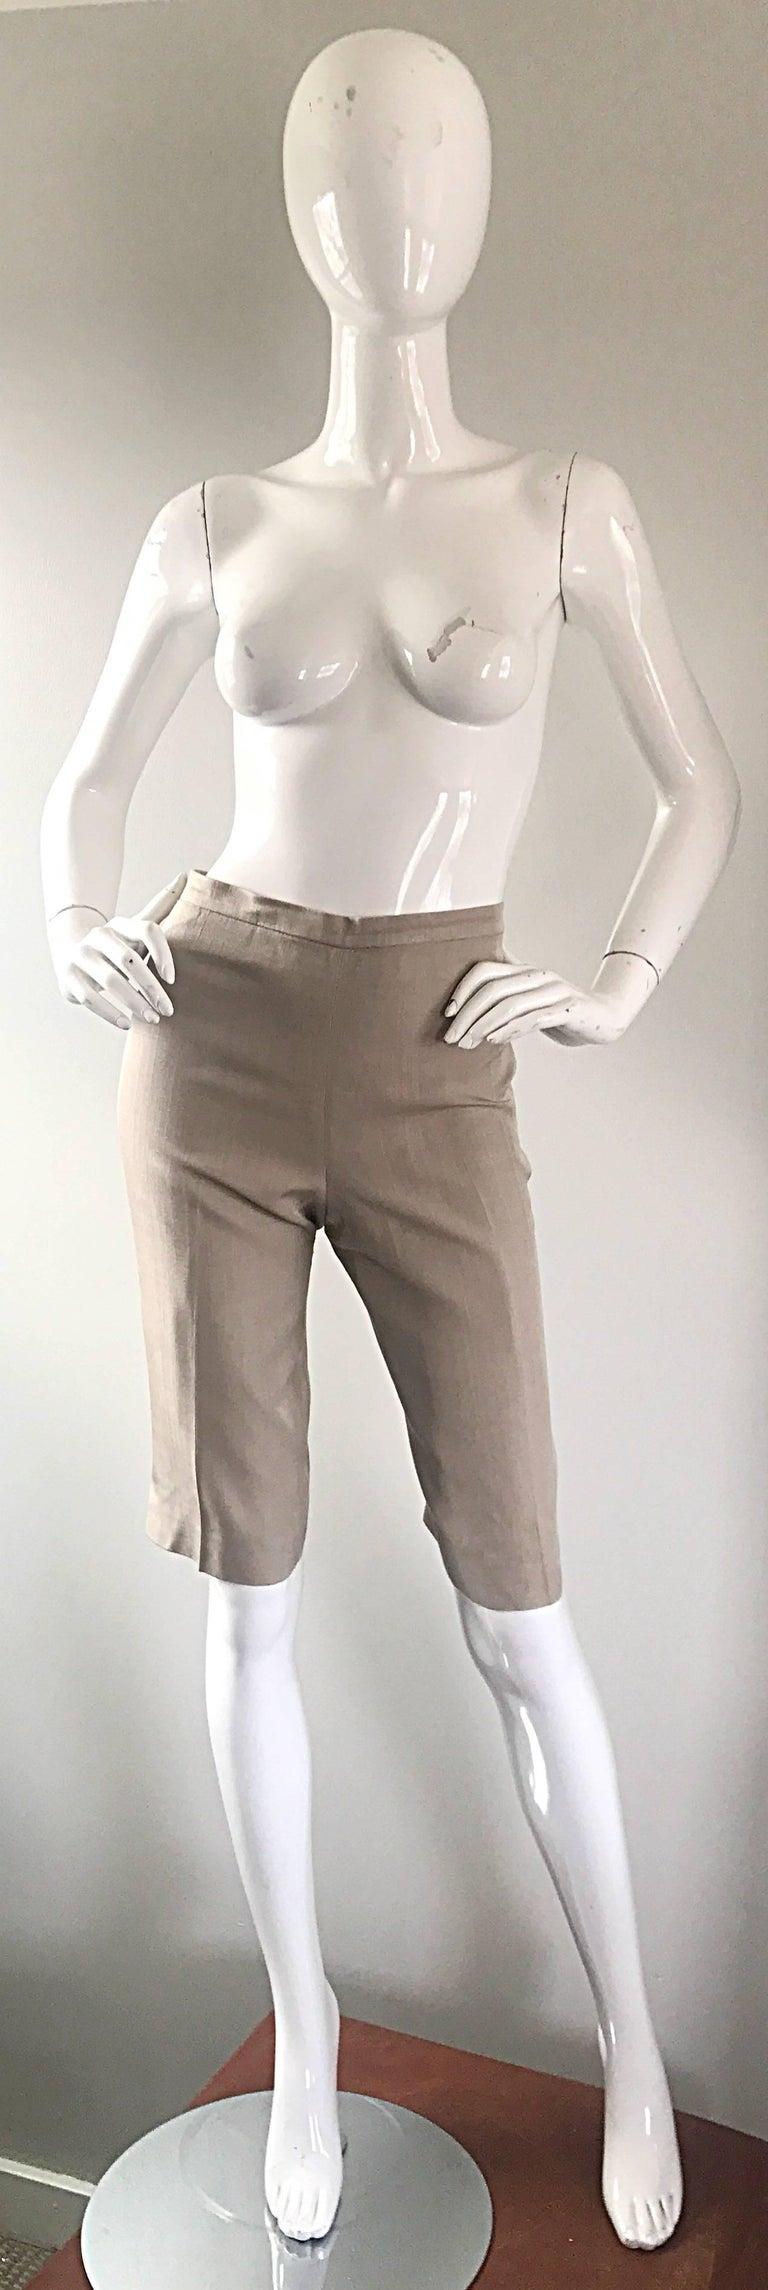 Vintage Michael Kors Collection 1990s Khaki Silk Cropped Capri Pants Shorts Sz 6 9